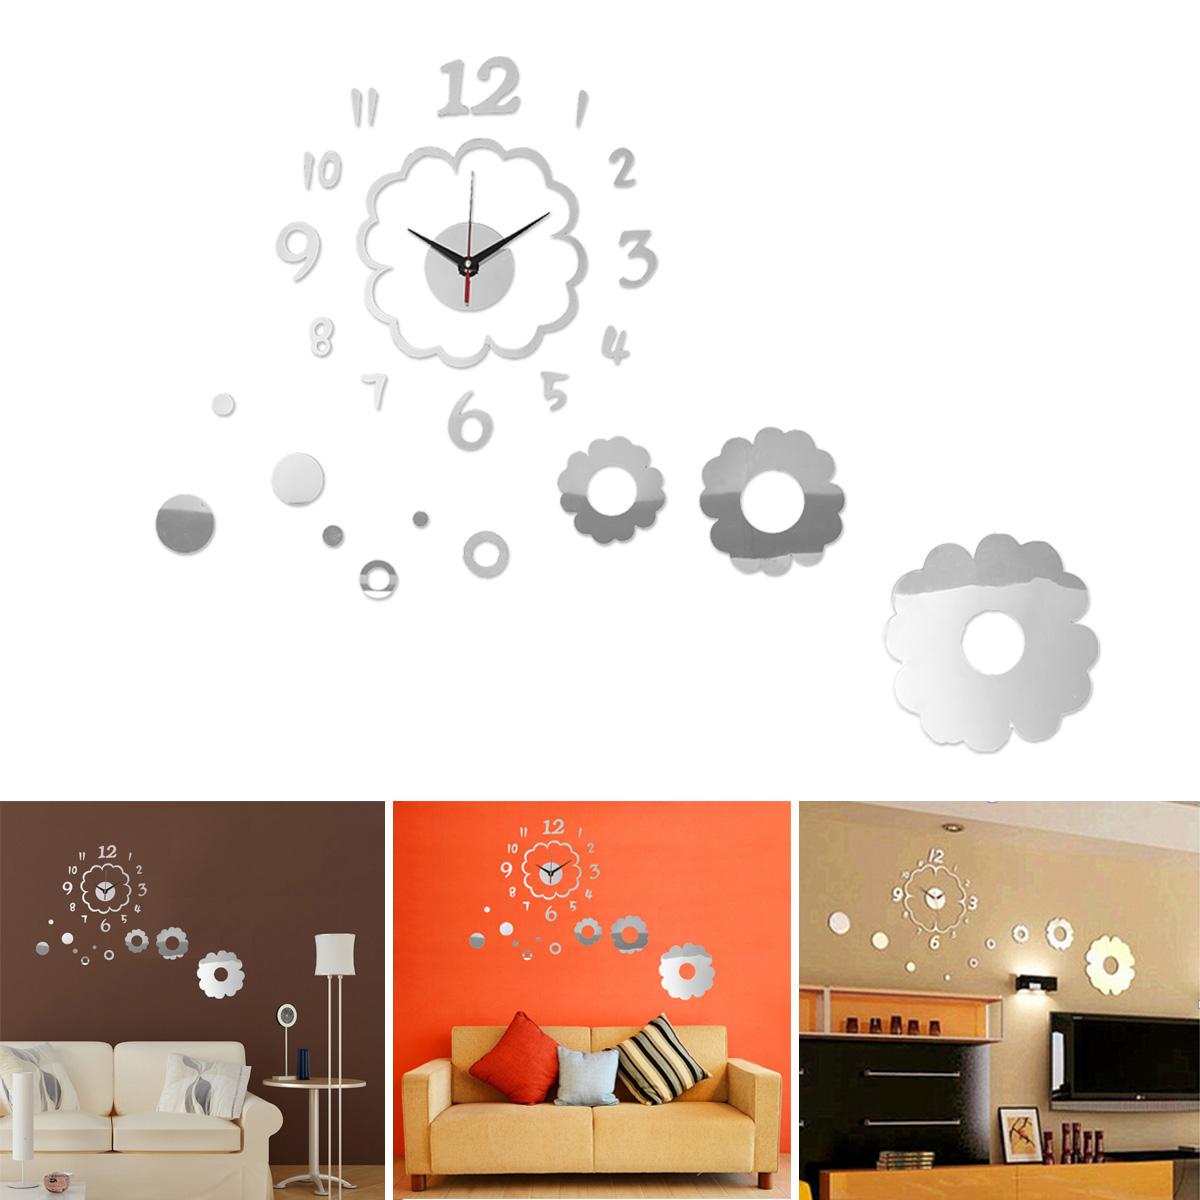 Modern acrylic mirror surface diy large wall clock sticker for Wall stickers decor modern